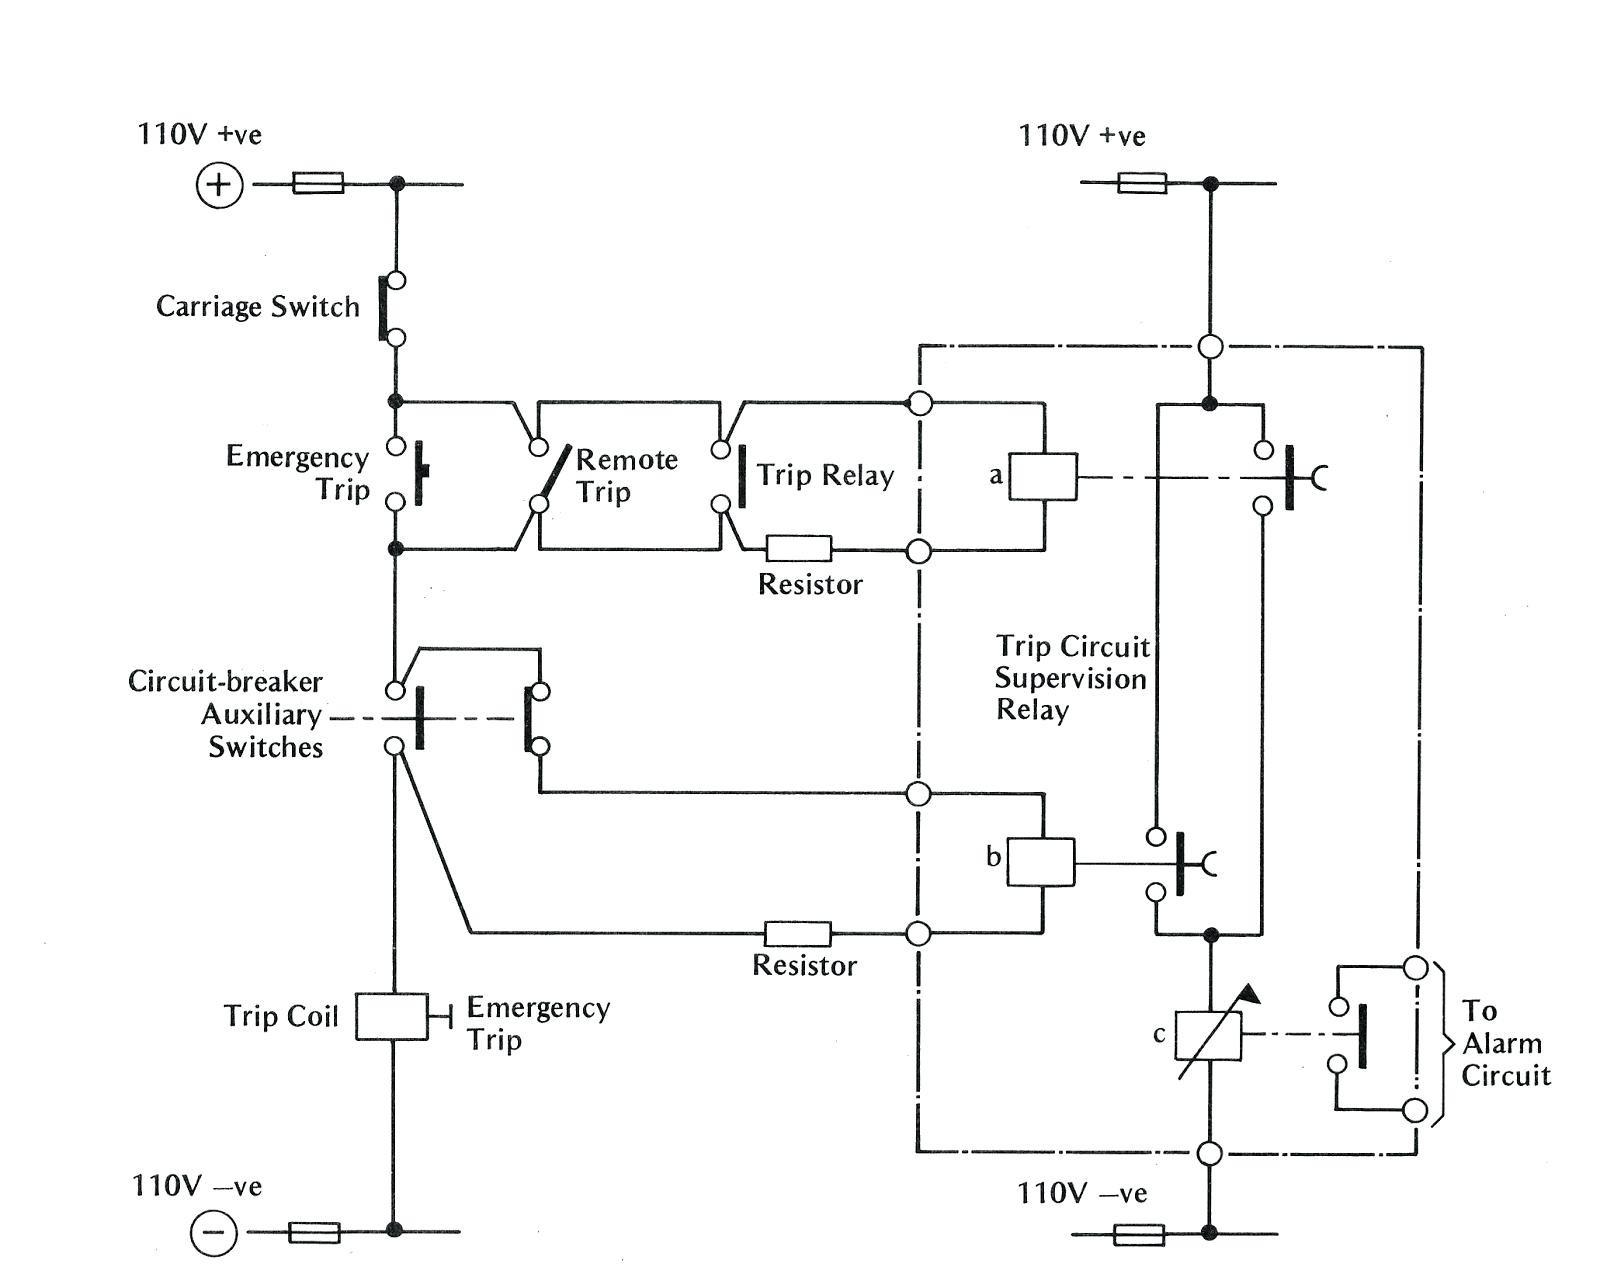 Cutler Hammer Starter Wiring Diagram Beautiful Reversing Starter Schematic Everything You Need Of Cutler Hammer Starter Wiring Diagram